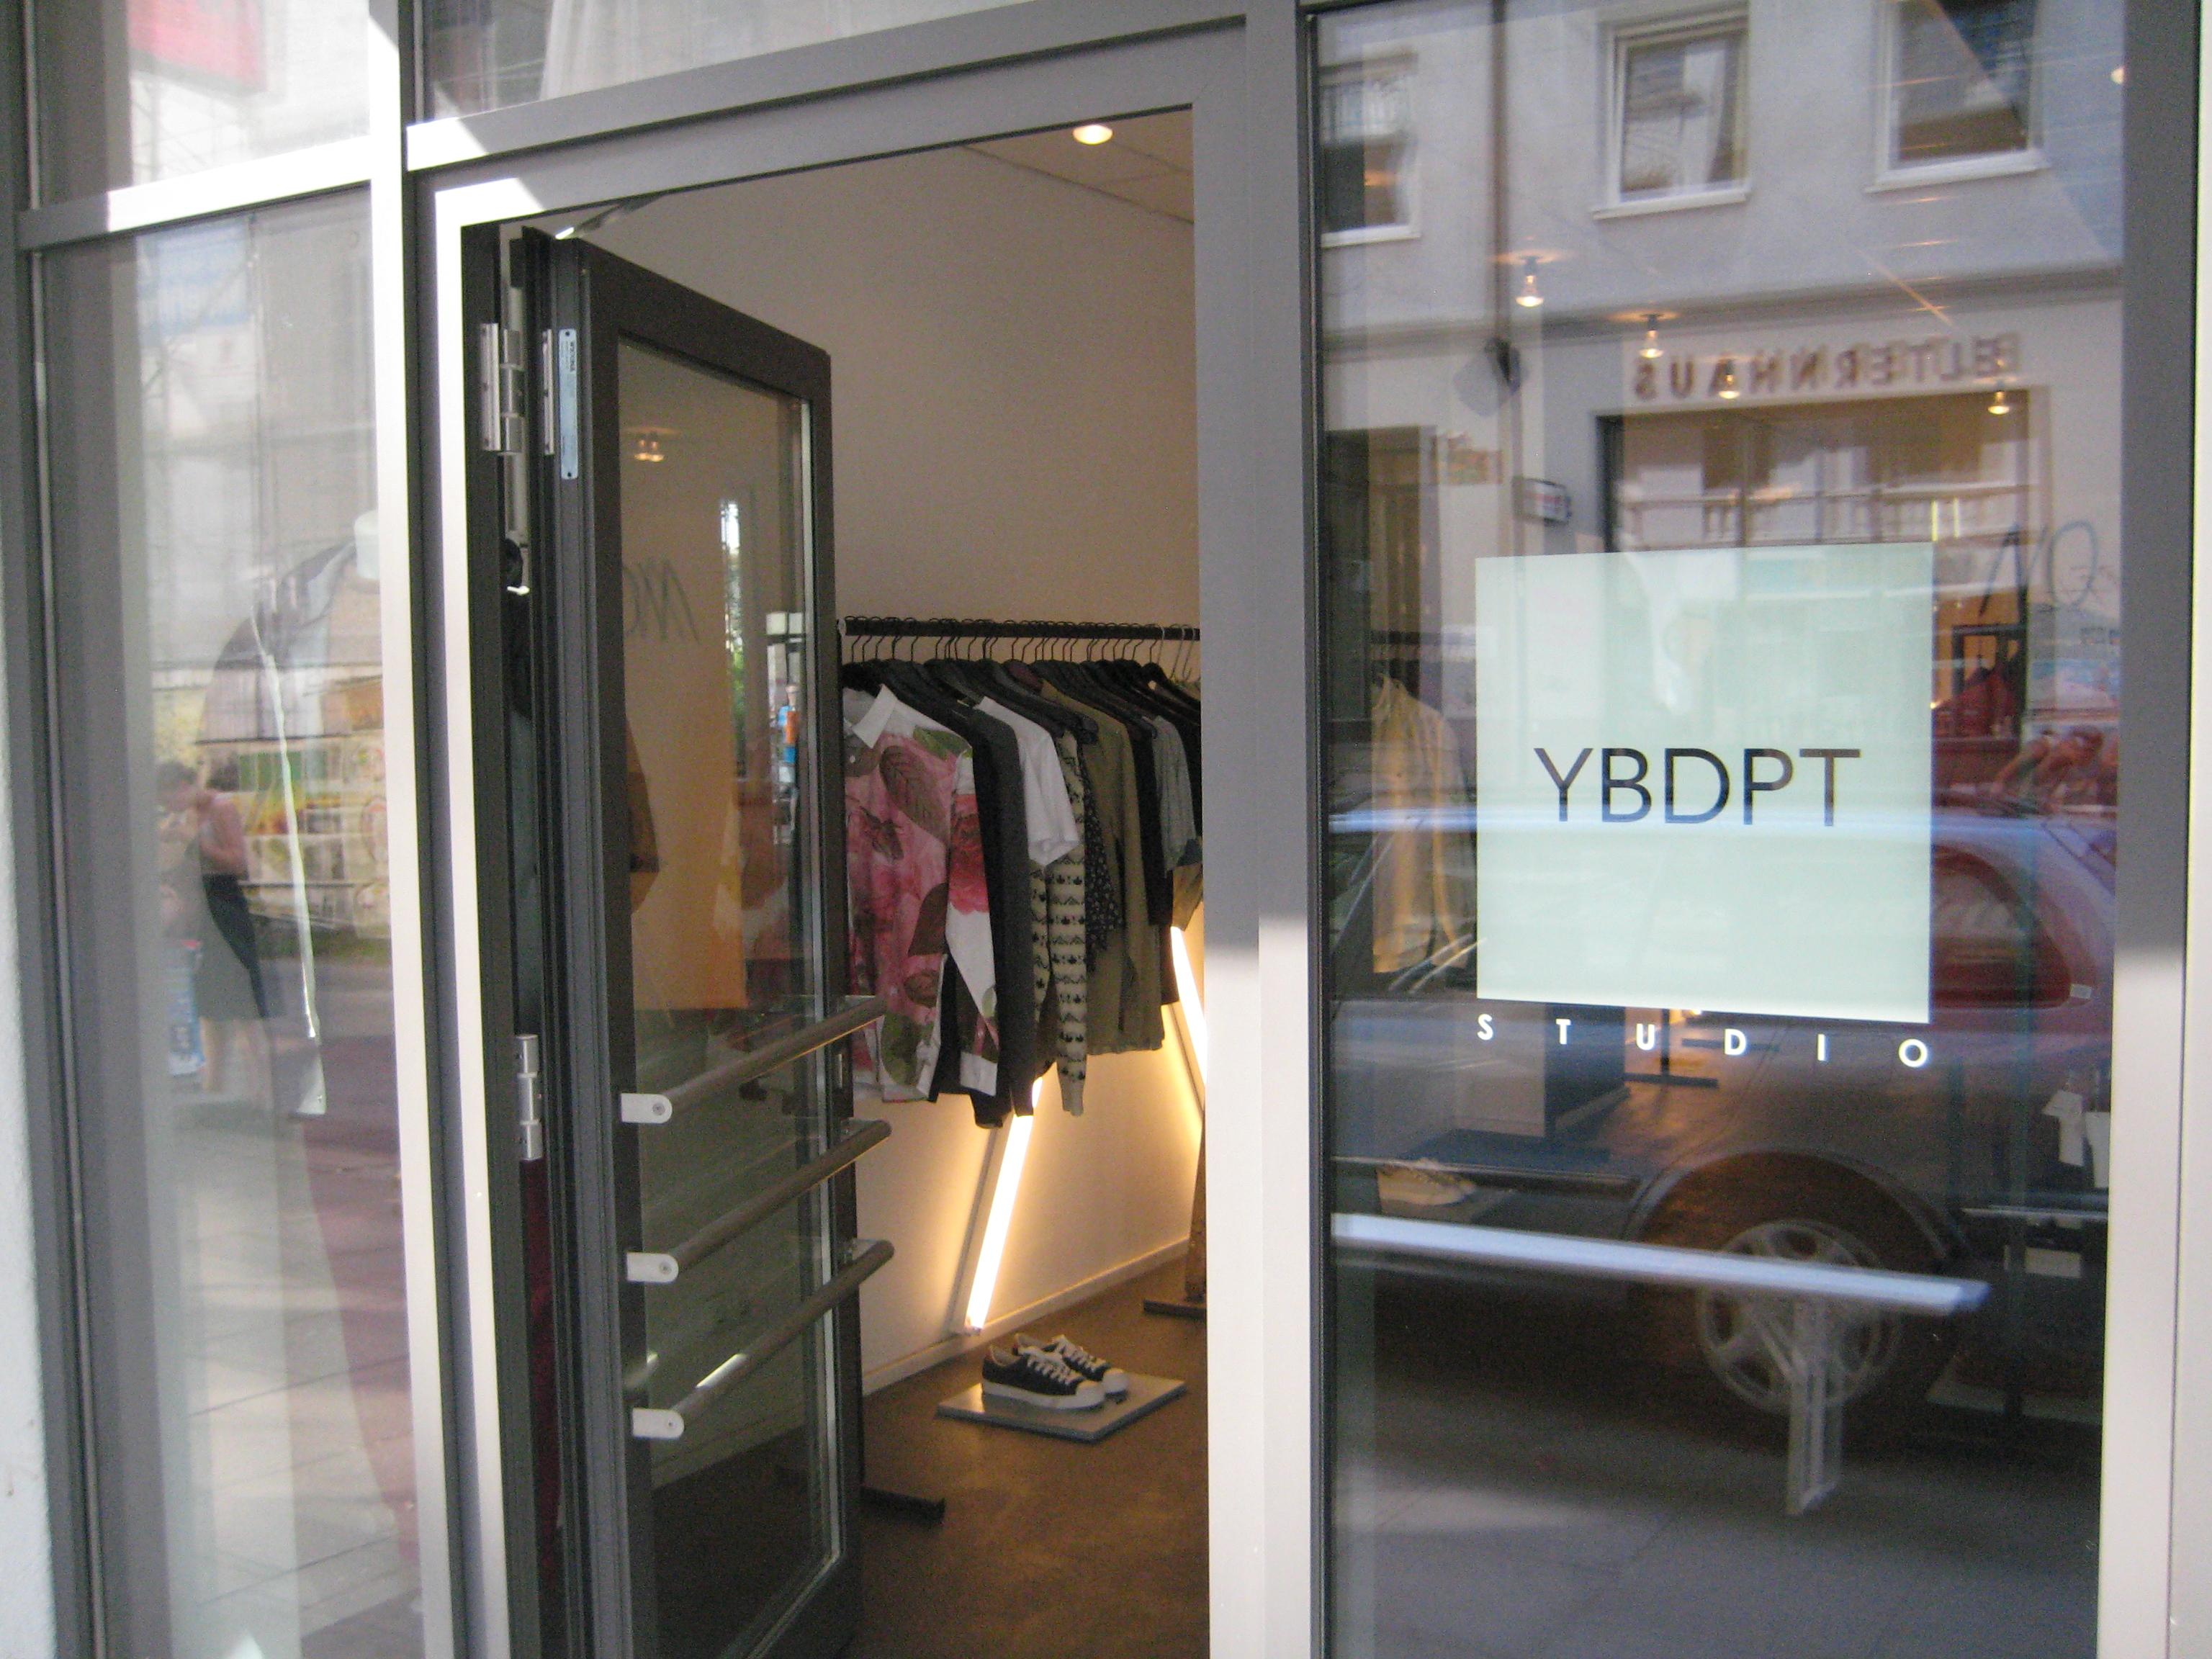 YBDPT front